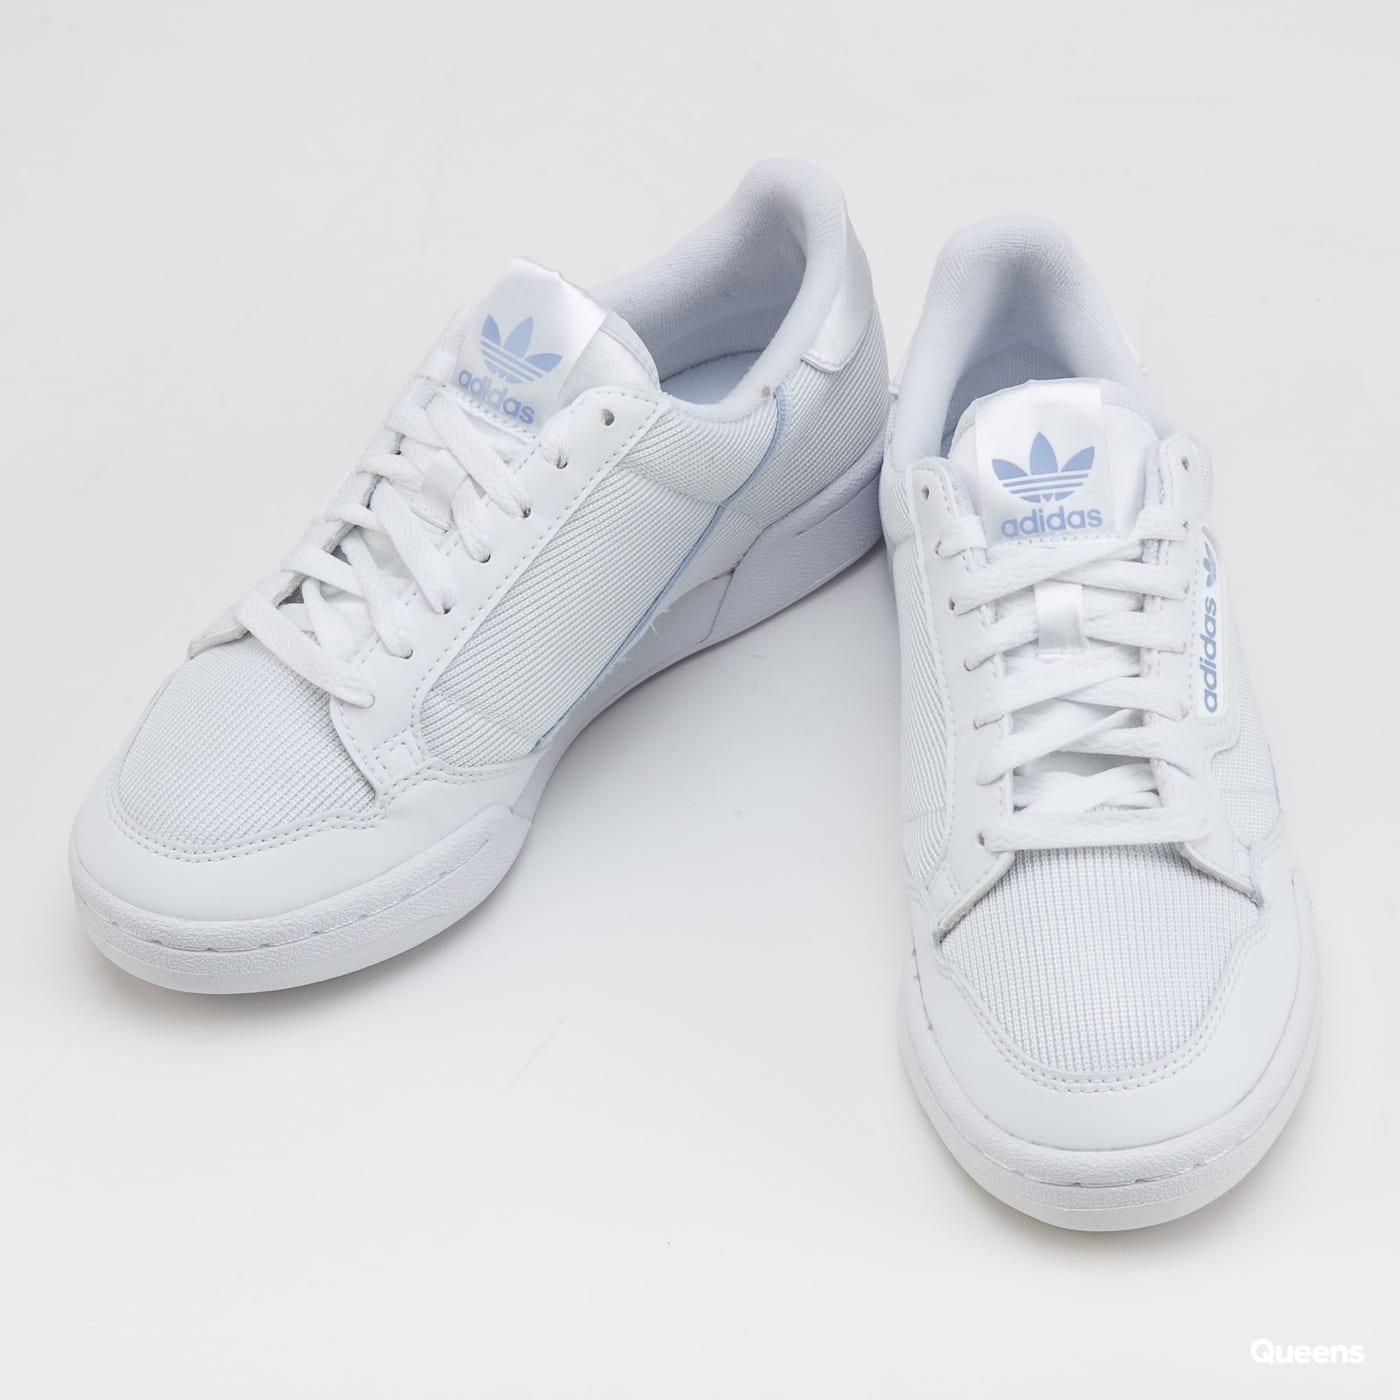 adidas Originals Continental 80 W ftwwht / periwi / cblack